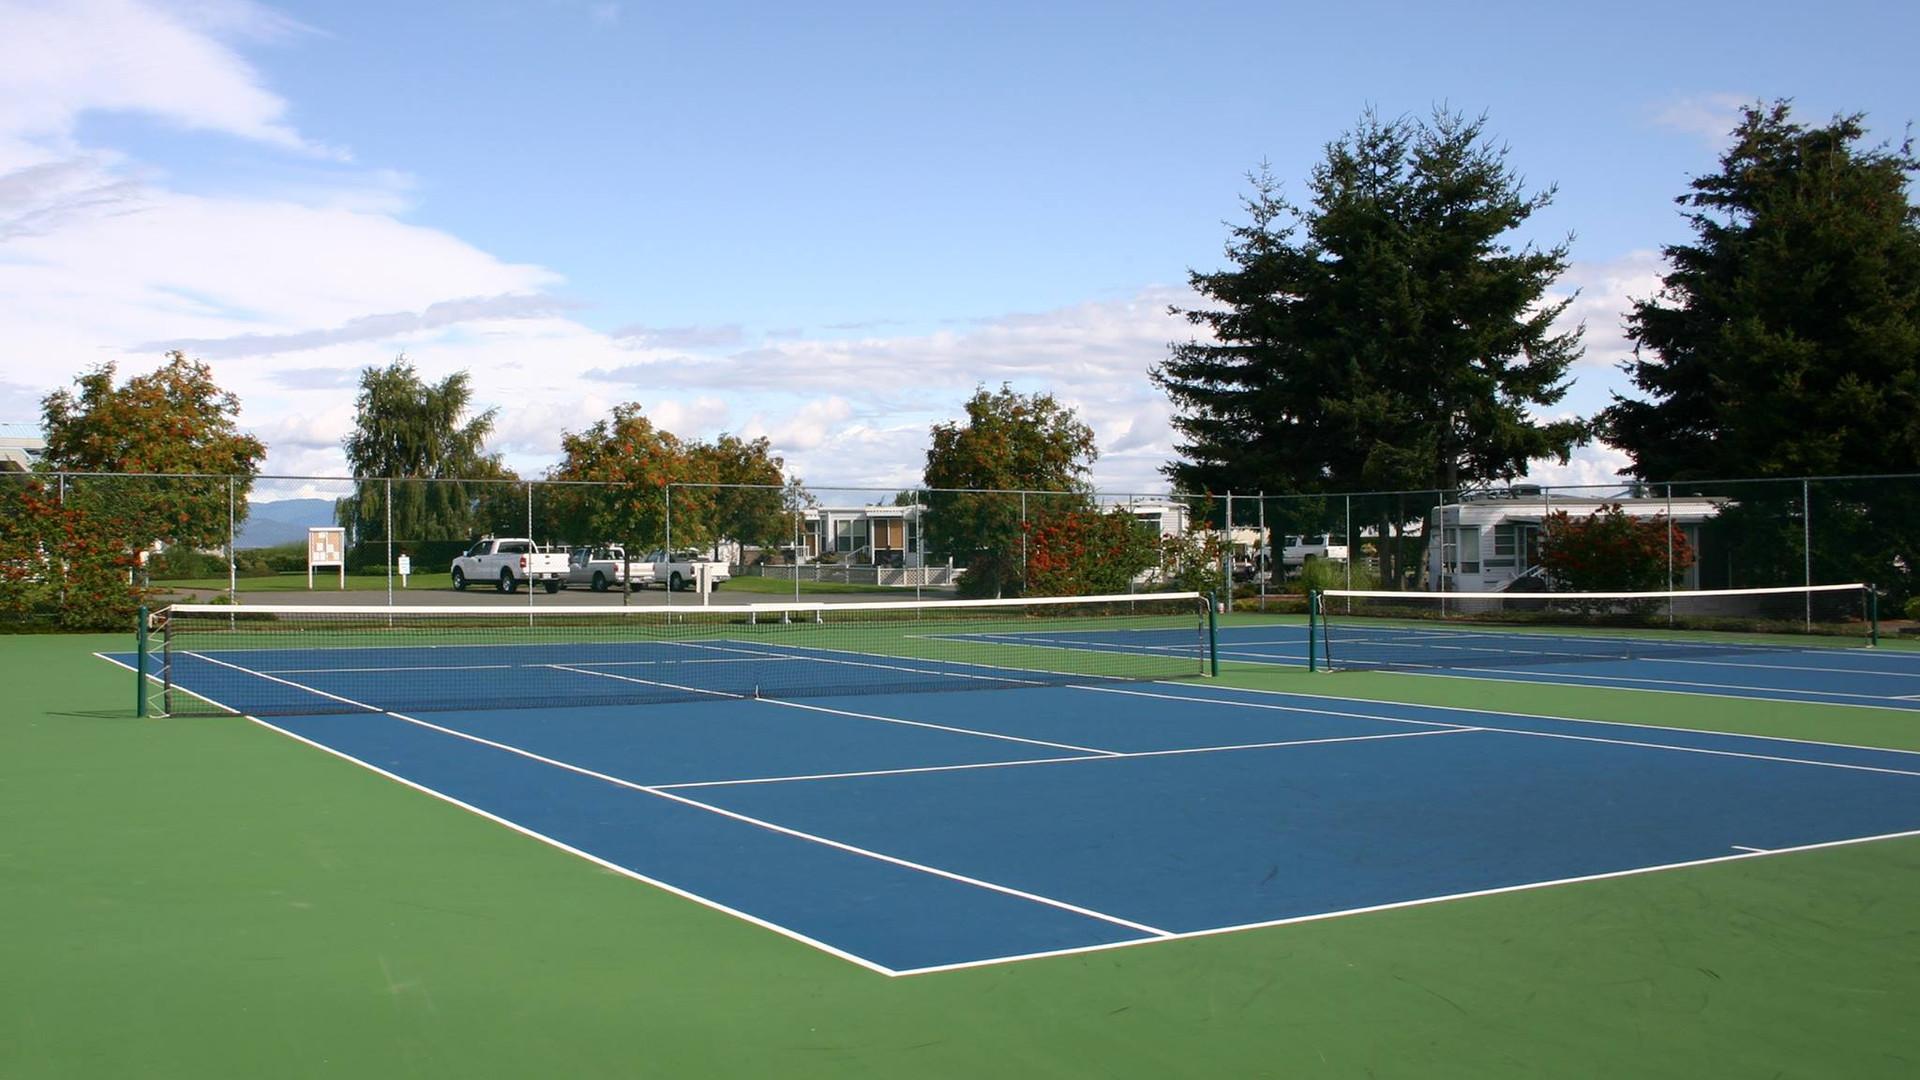 tennis_courts_Surfside_RV_lots.jpg